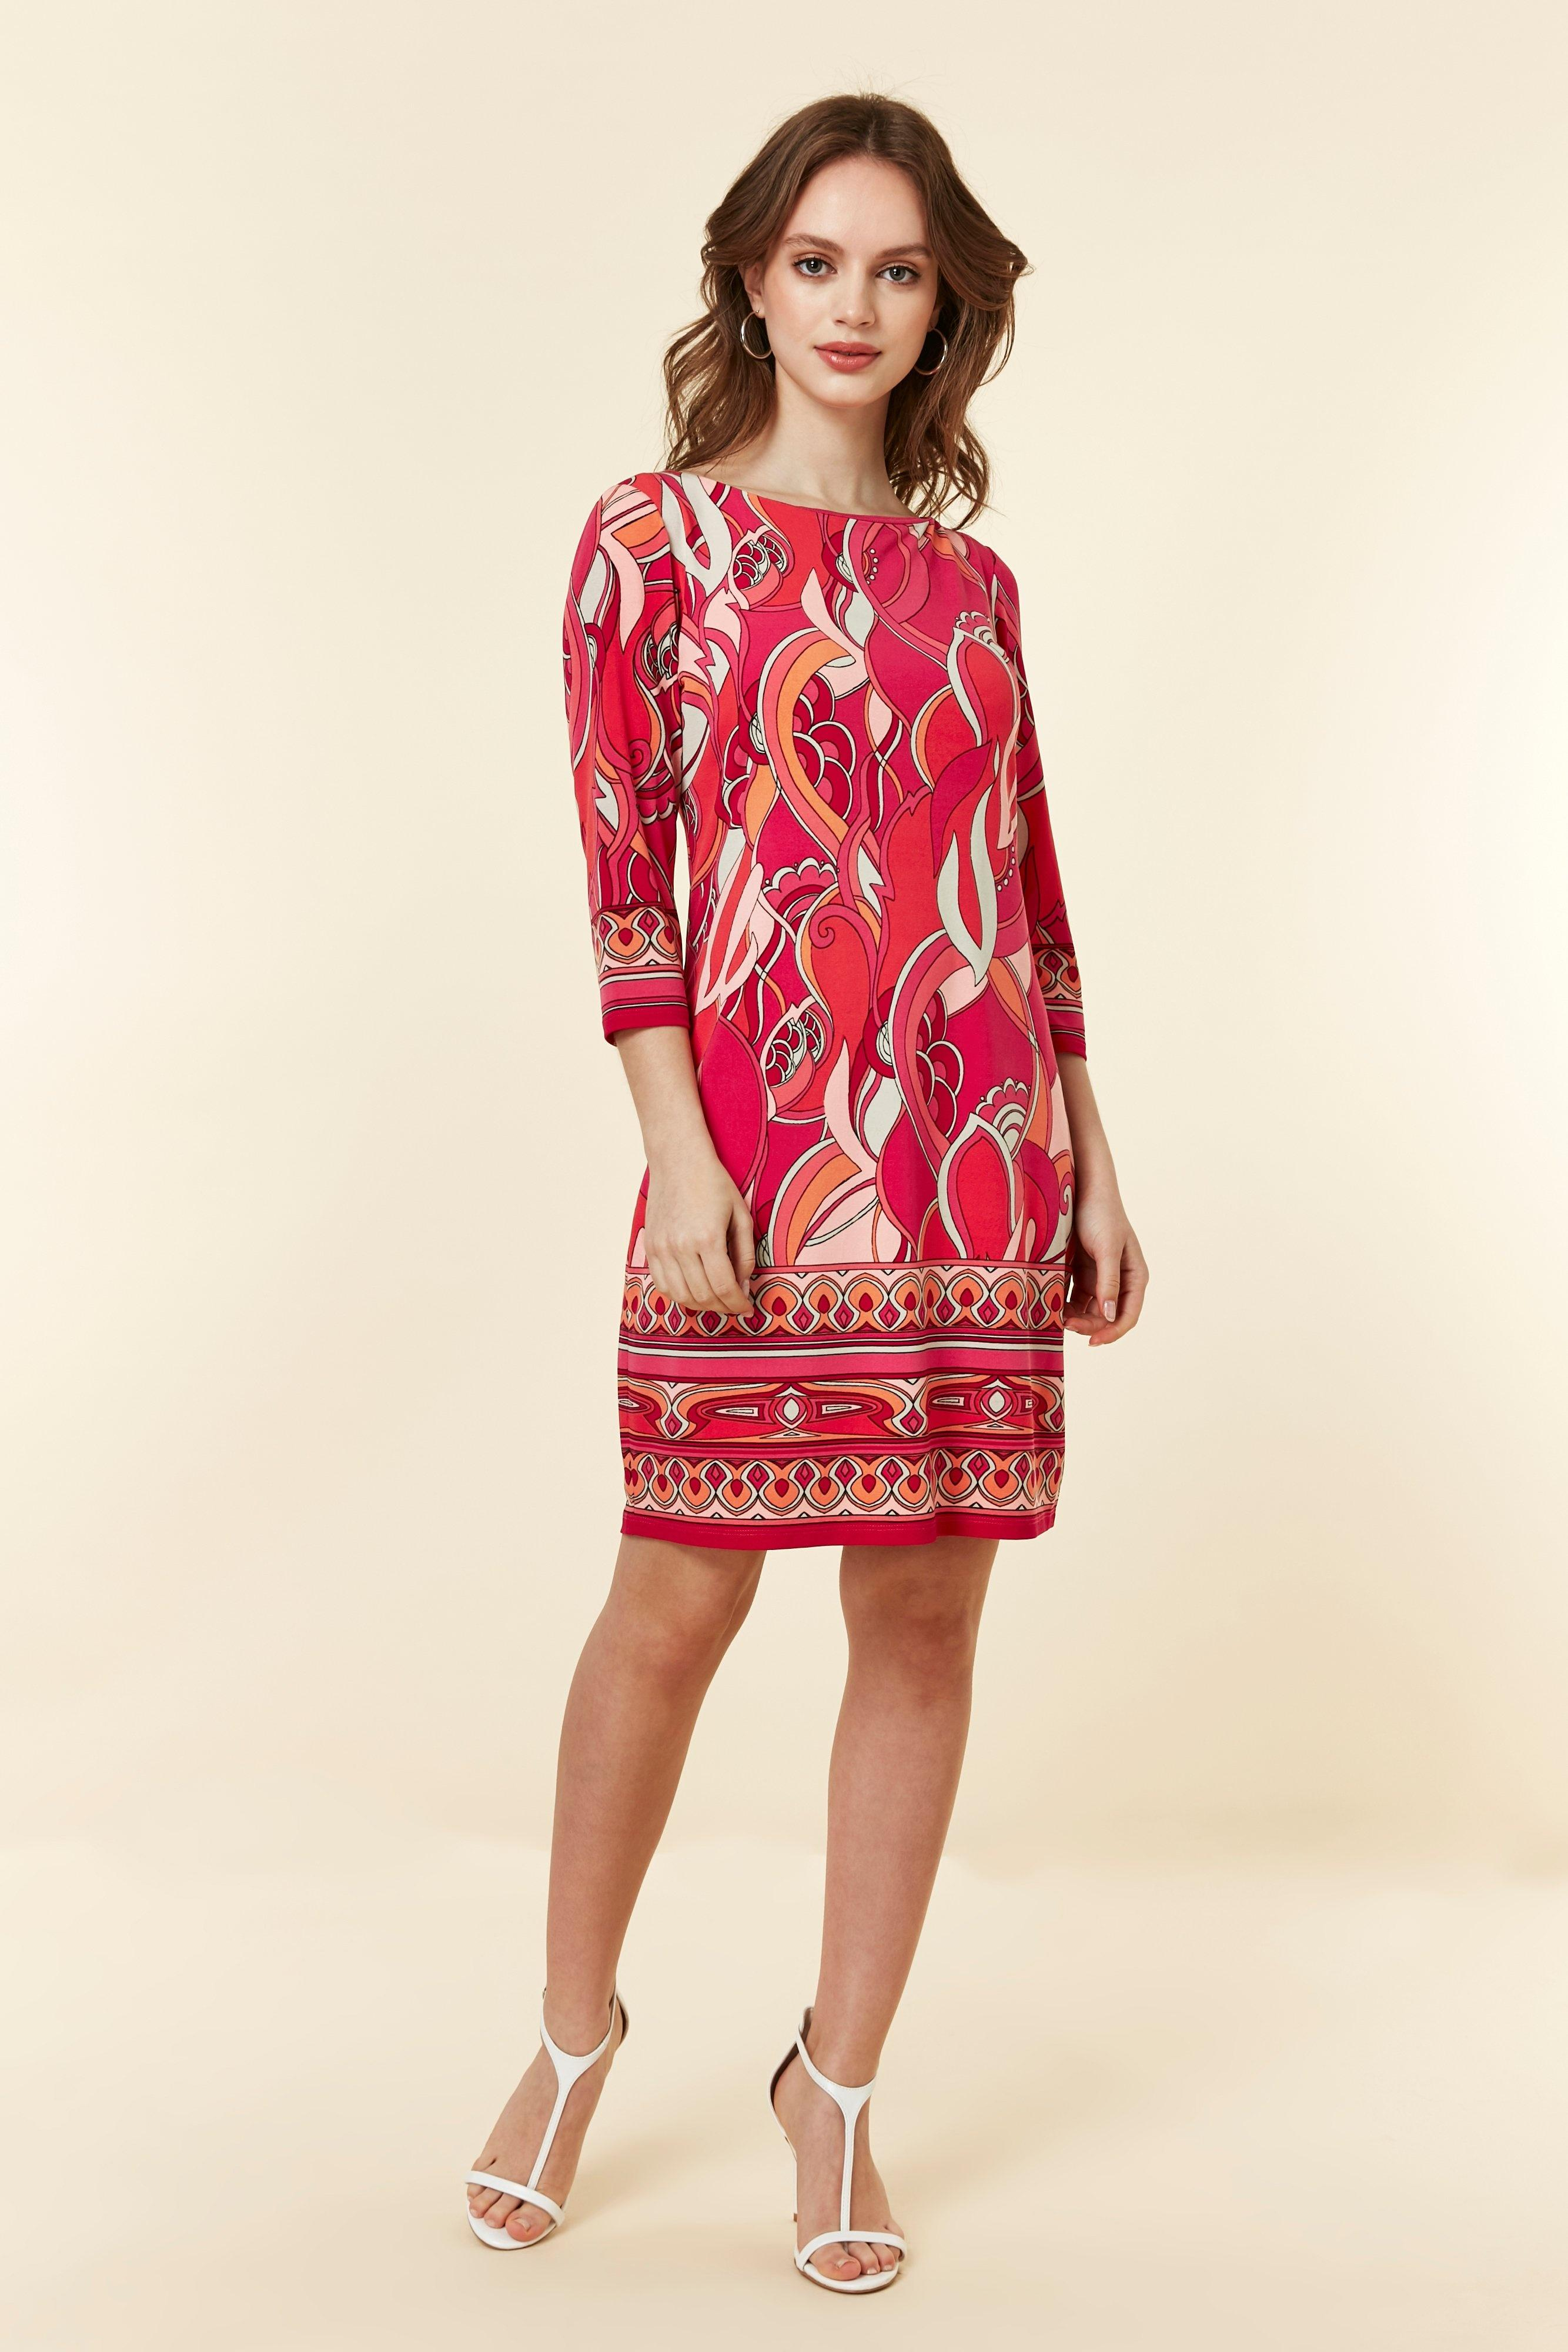 2a1529a8b90 Wallis - Petite Pink Swirl Border Tunic Dress - Lyst. View fullscreen